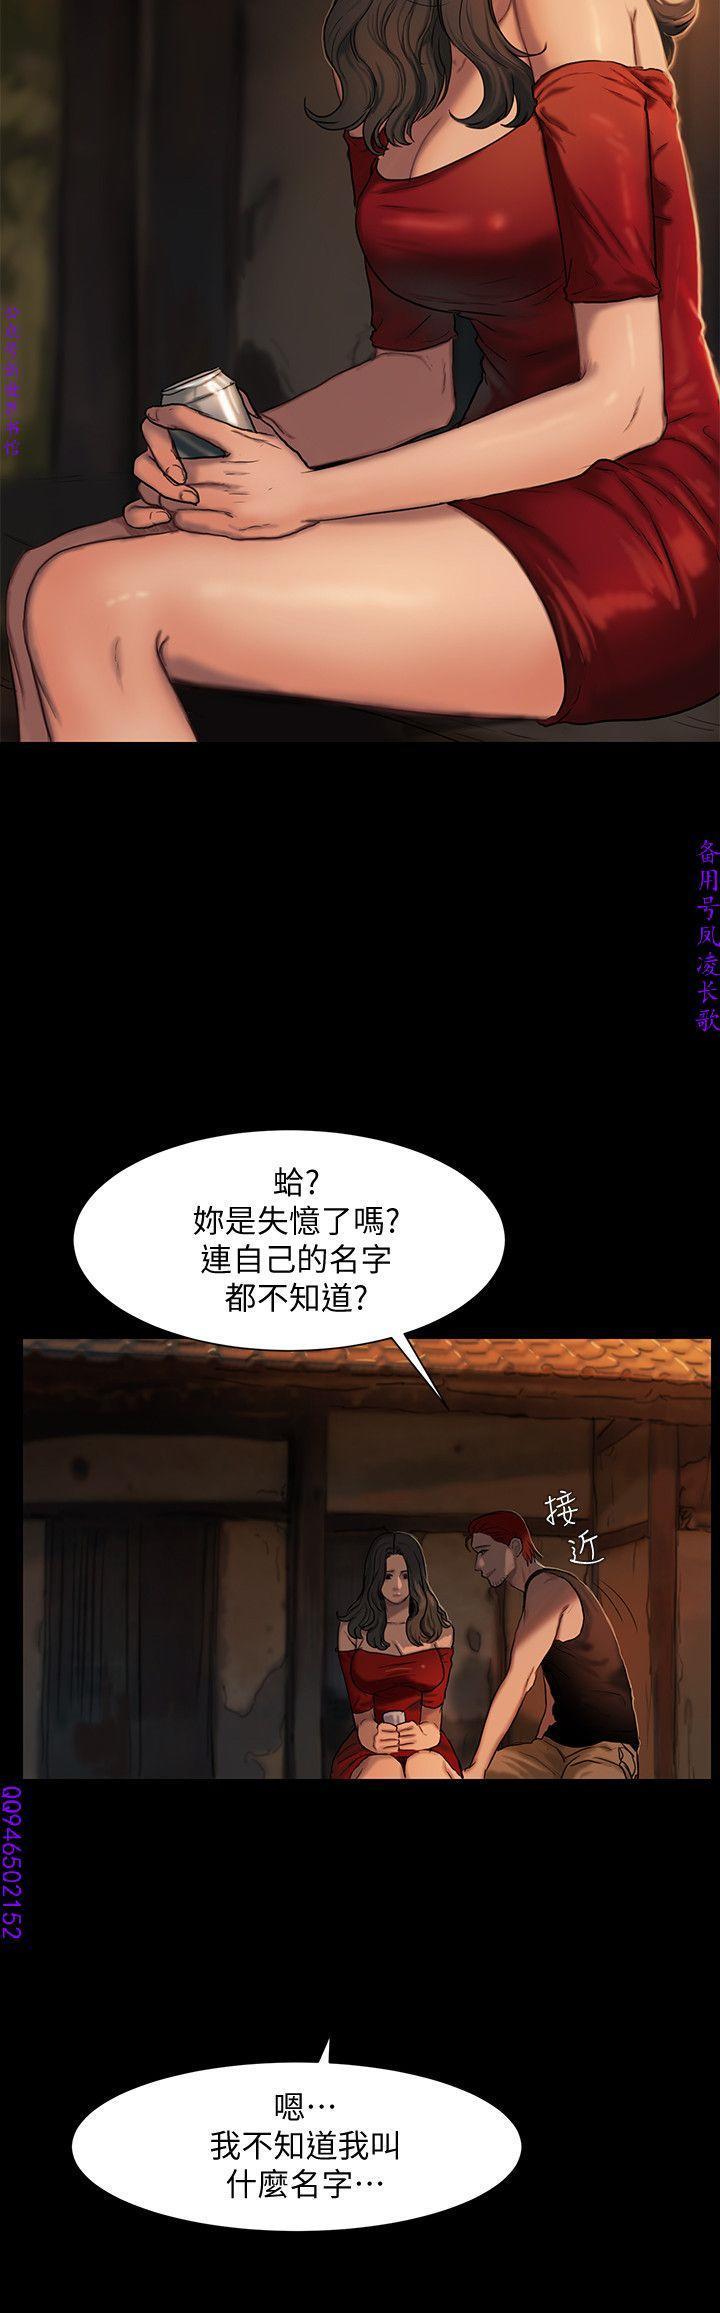 Run away 1-10【中文】 23